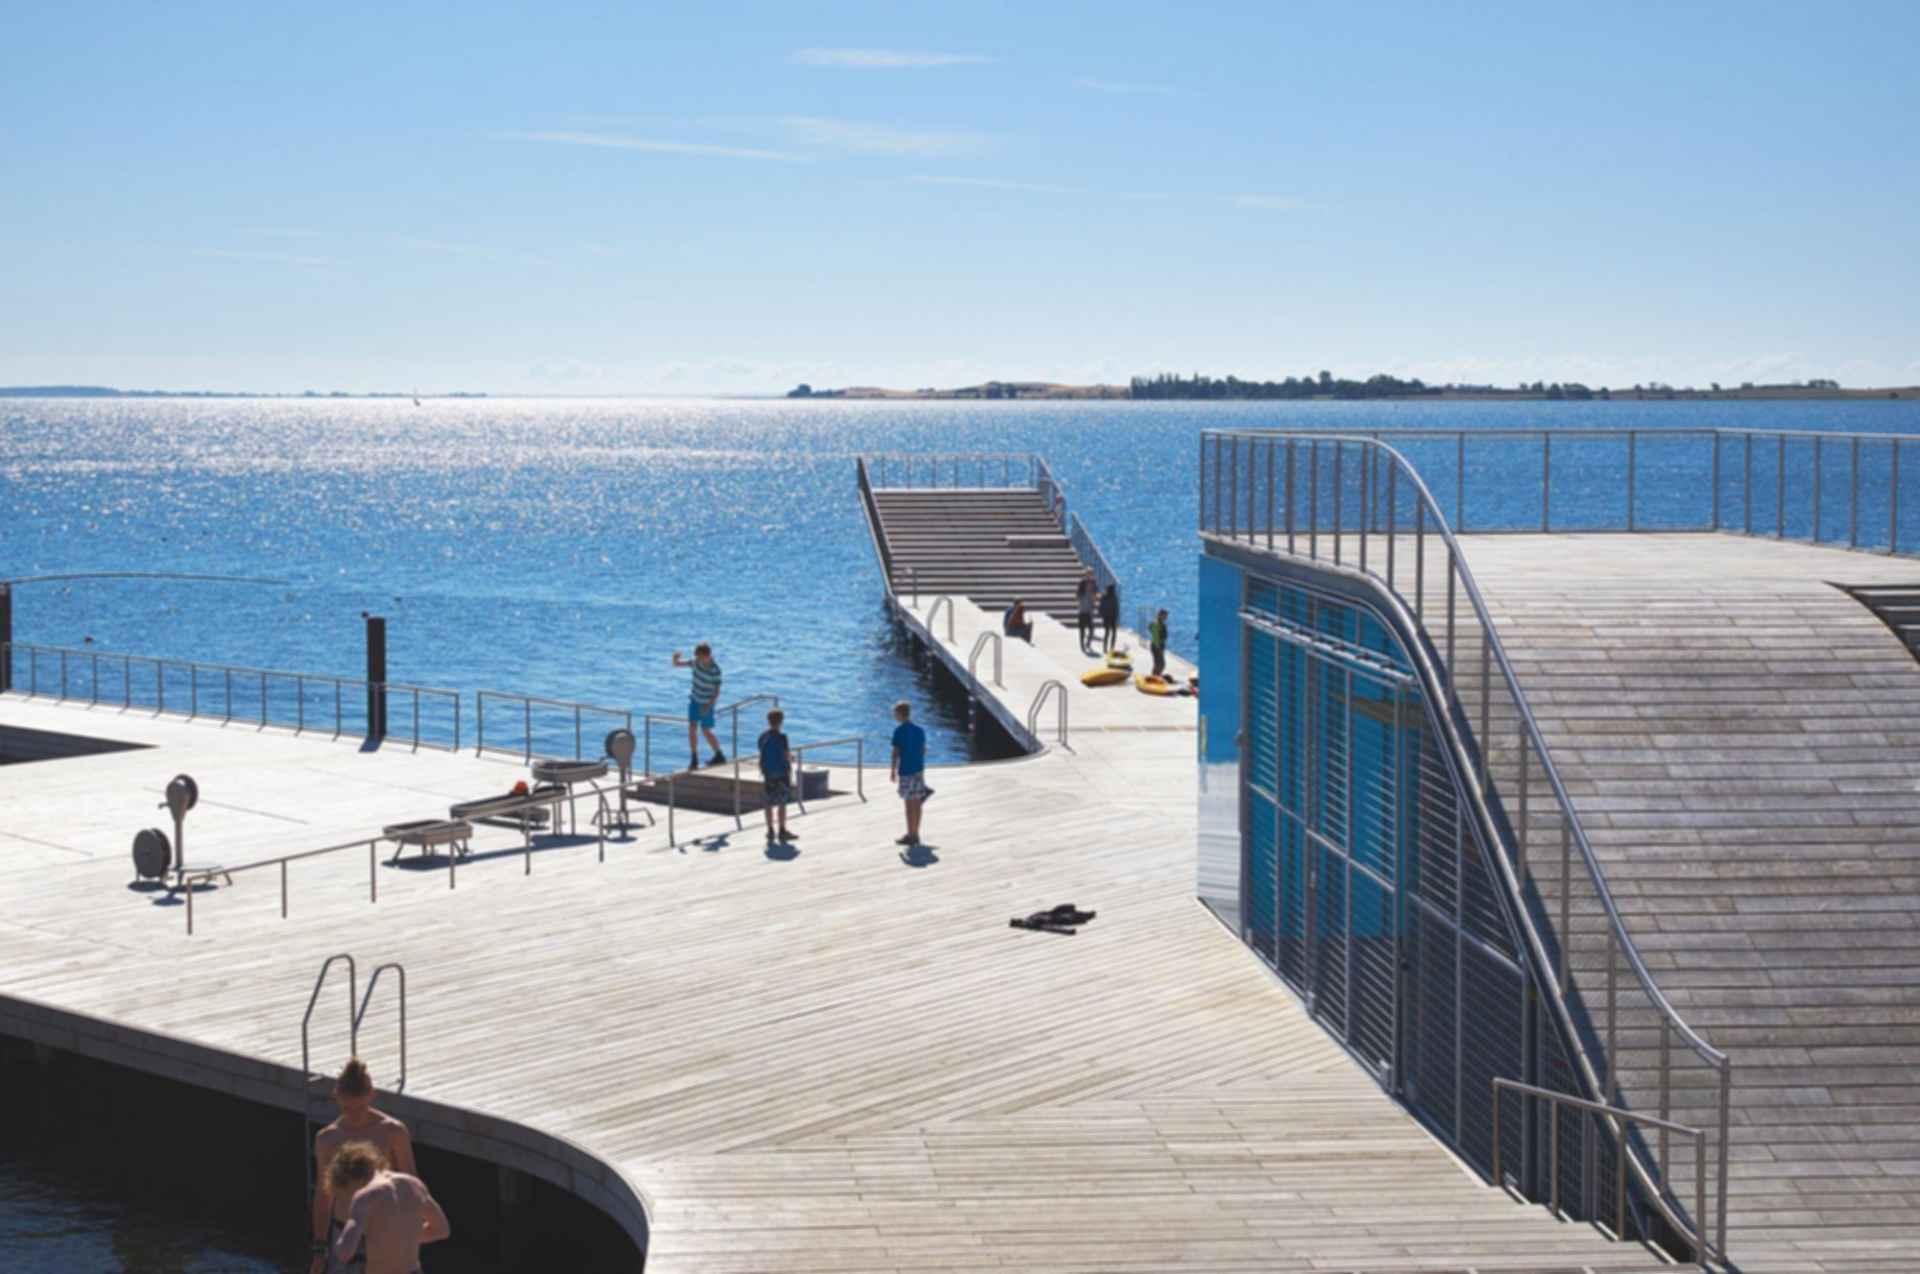 Kalvebod Waves - On the Pier